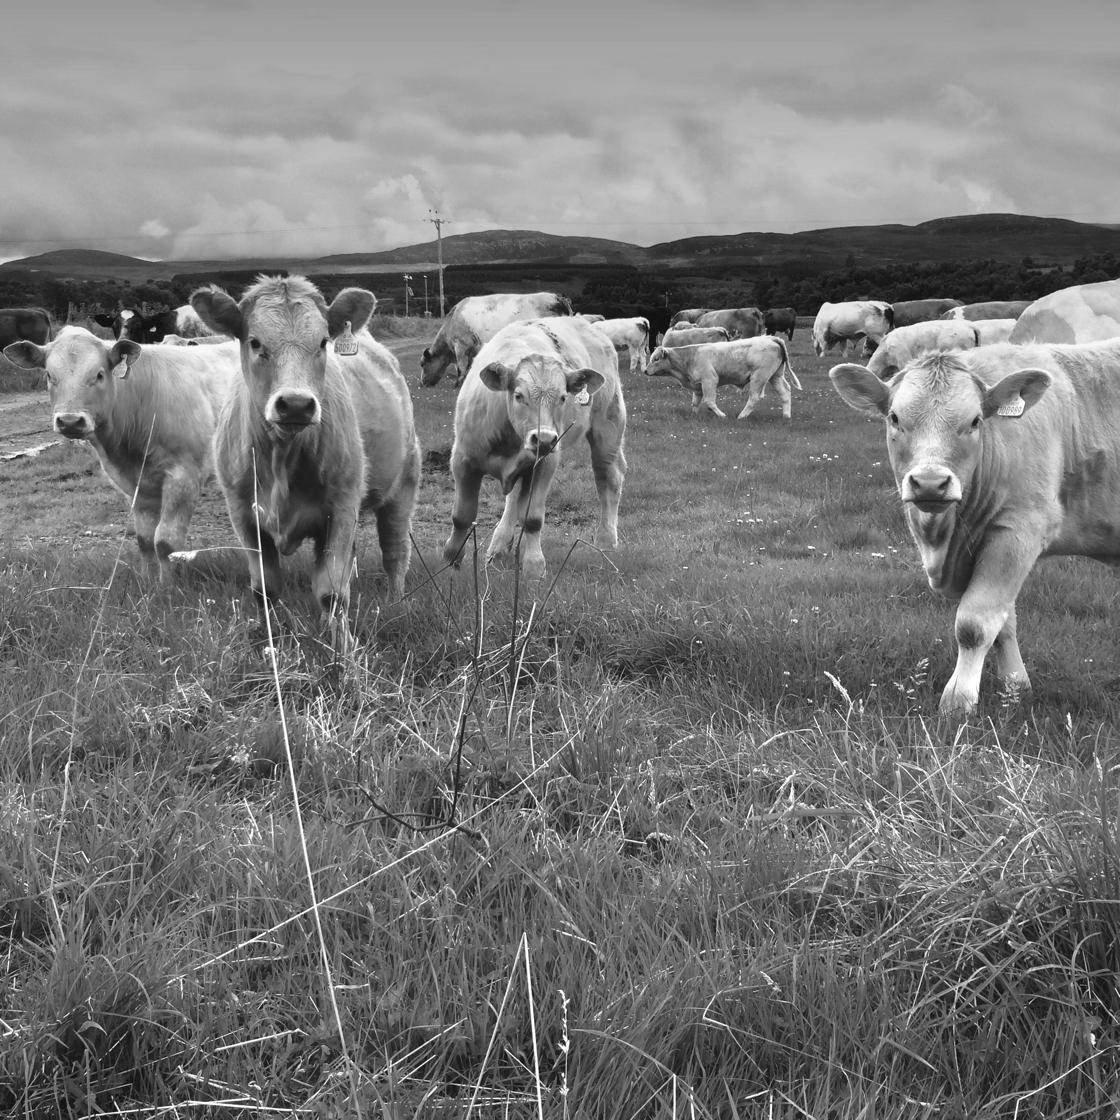 Rural Scenes-13 no script